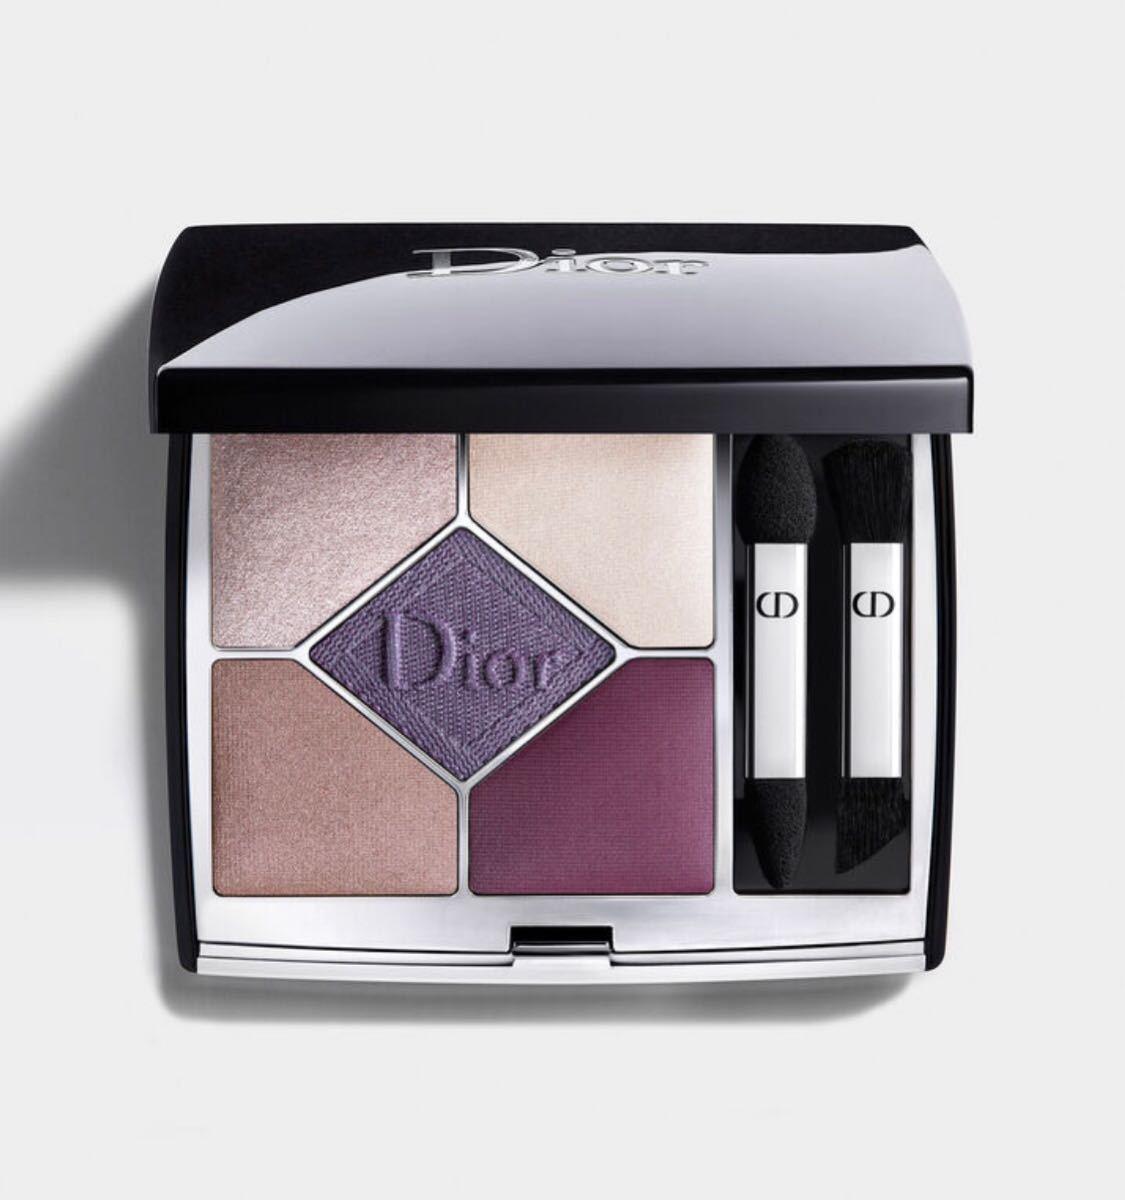 Dior アイシャドウ ディオール サンク クルール クチュール